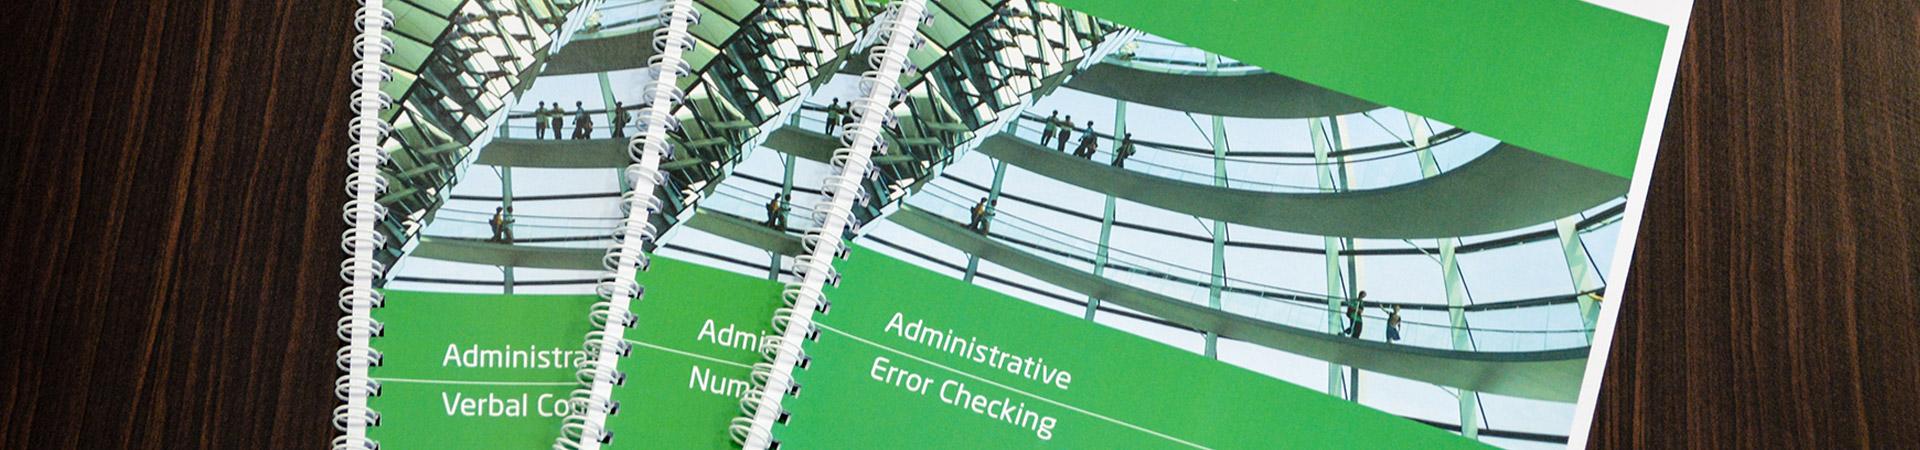 Single Administrative Aptitude Tests